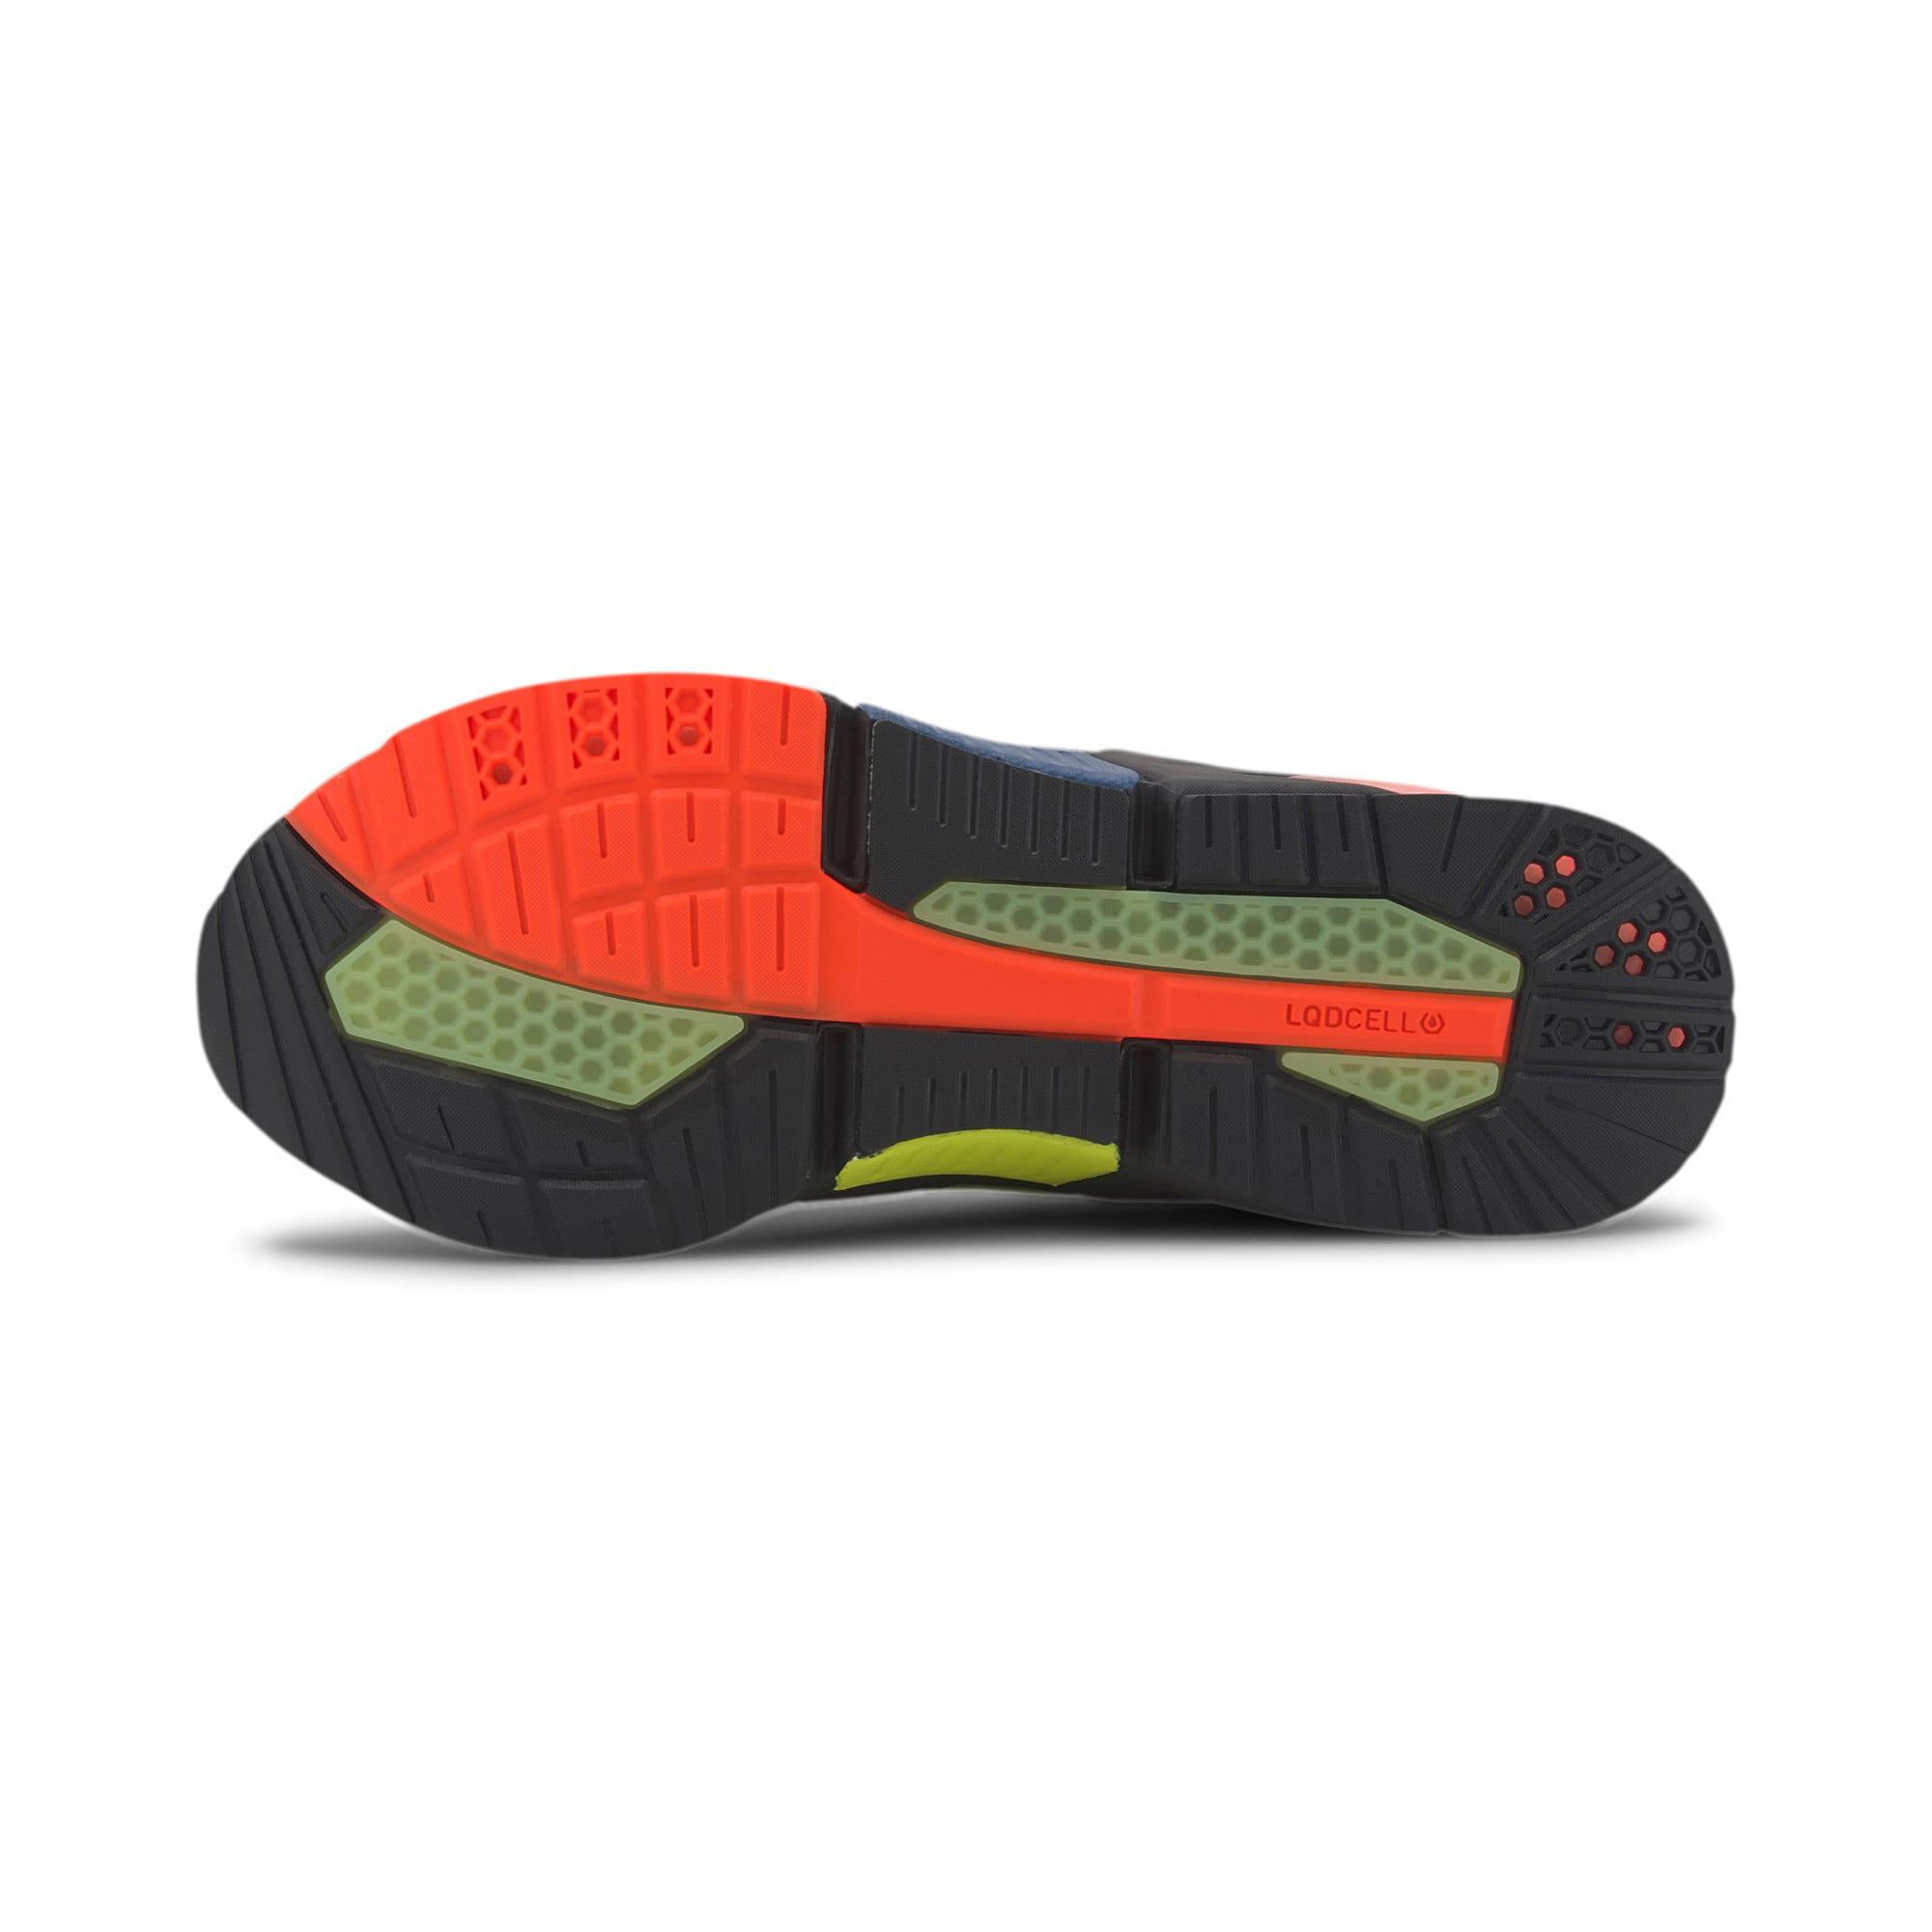 Thumbnail 4 of LQDCELL Optic Training Shoes, Puma Black, medium